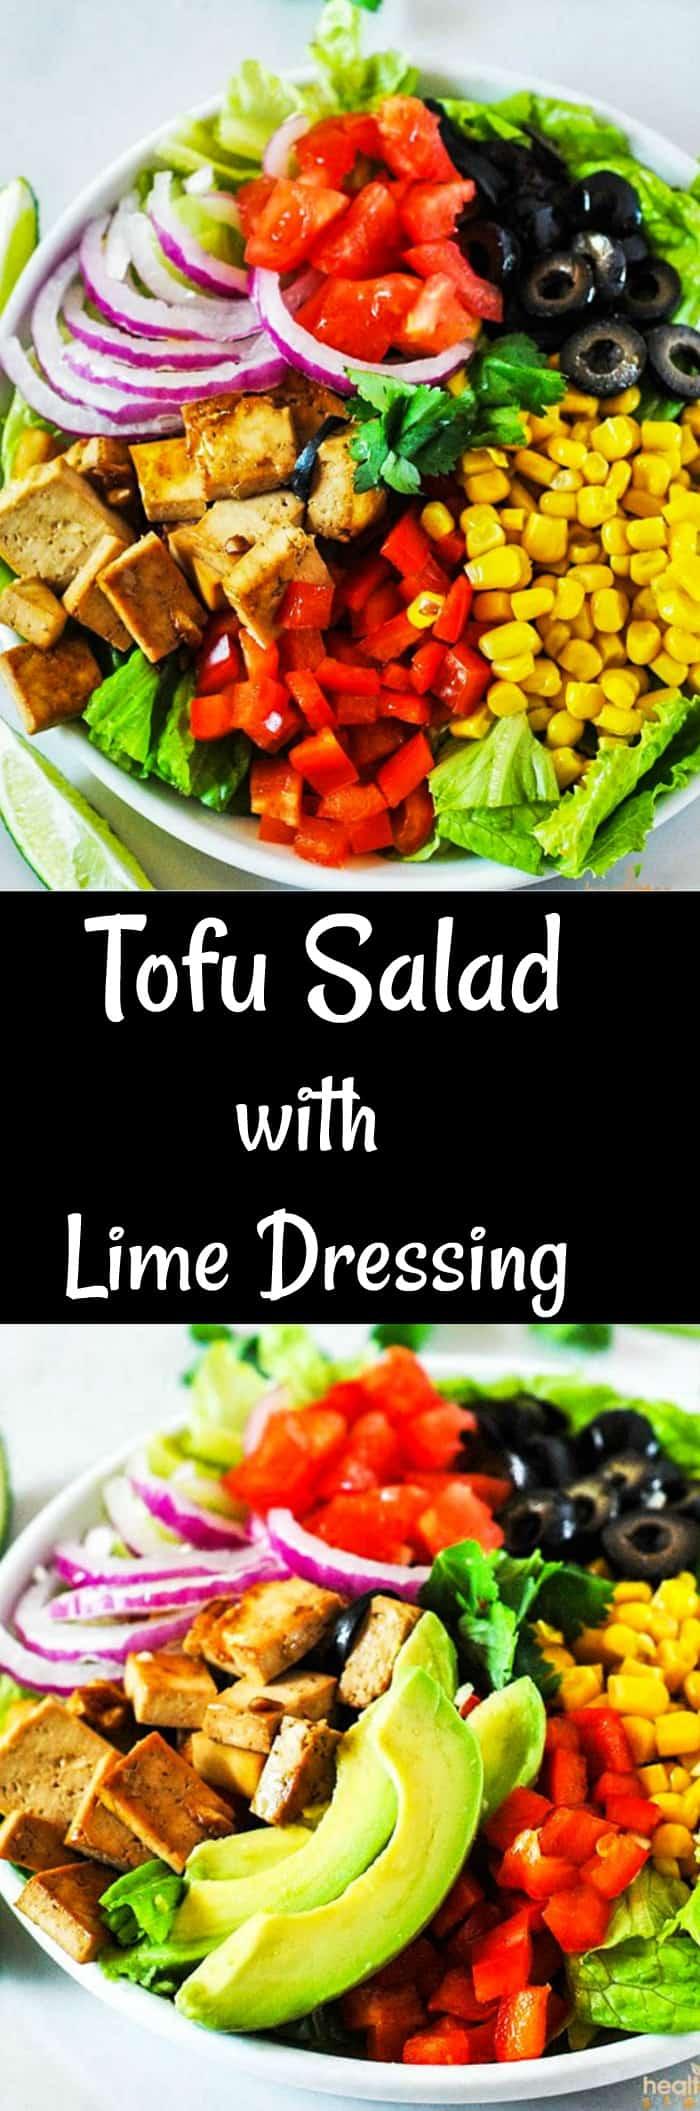 Tofu Salad With Lime Dressomg